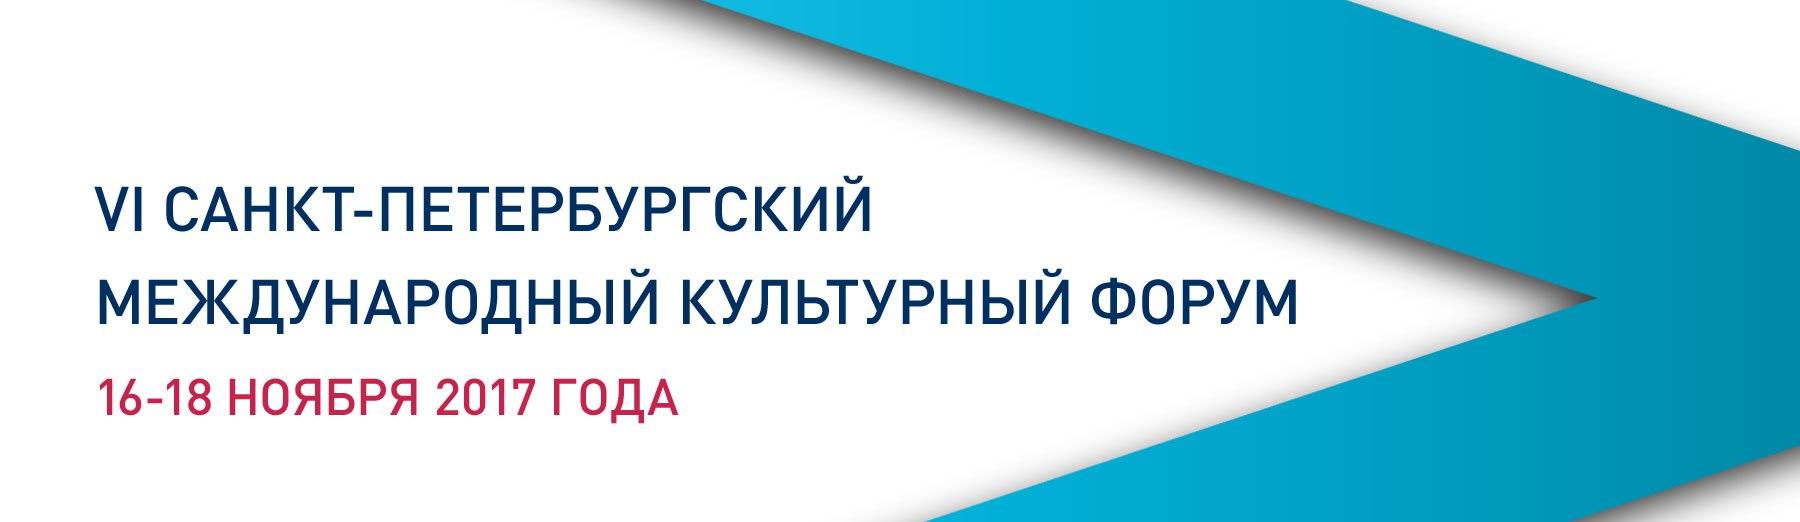 Санкт-Петербургского международного культурного форума